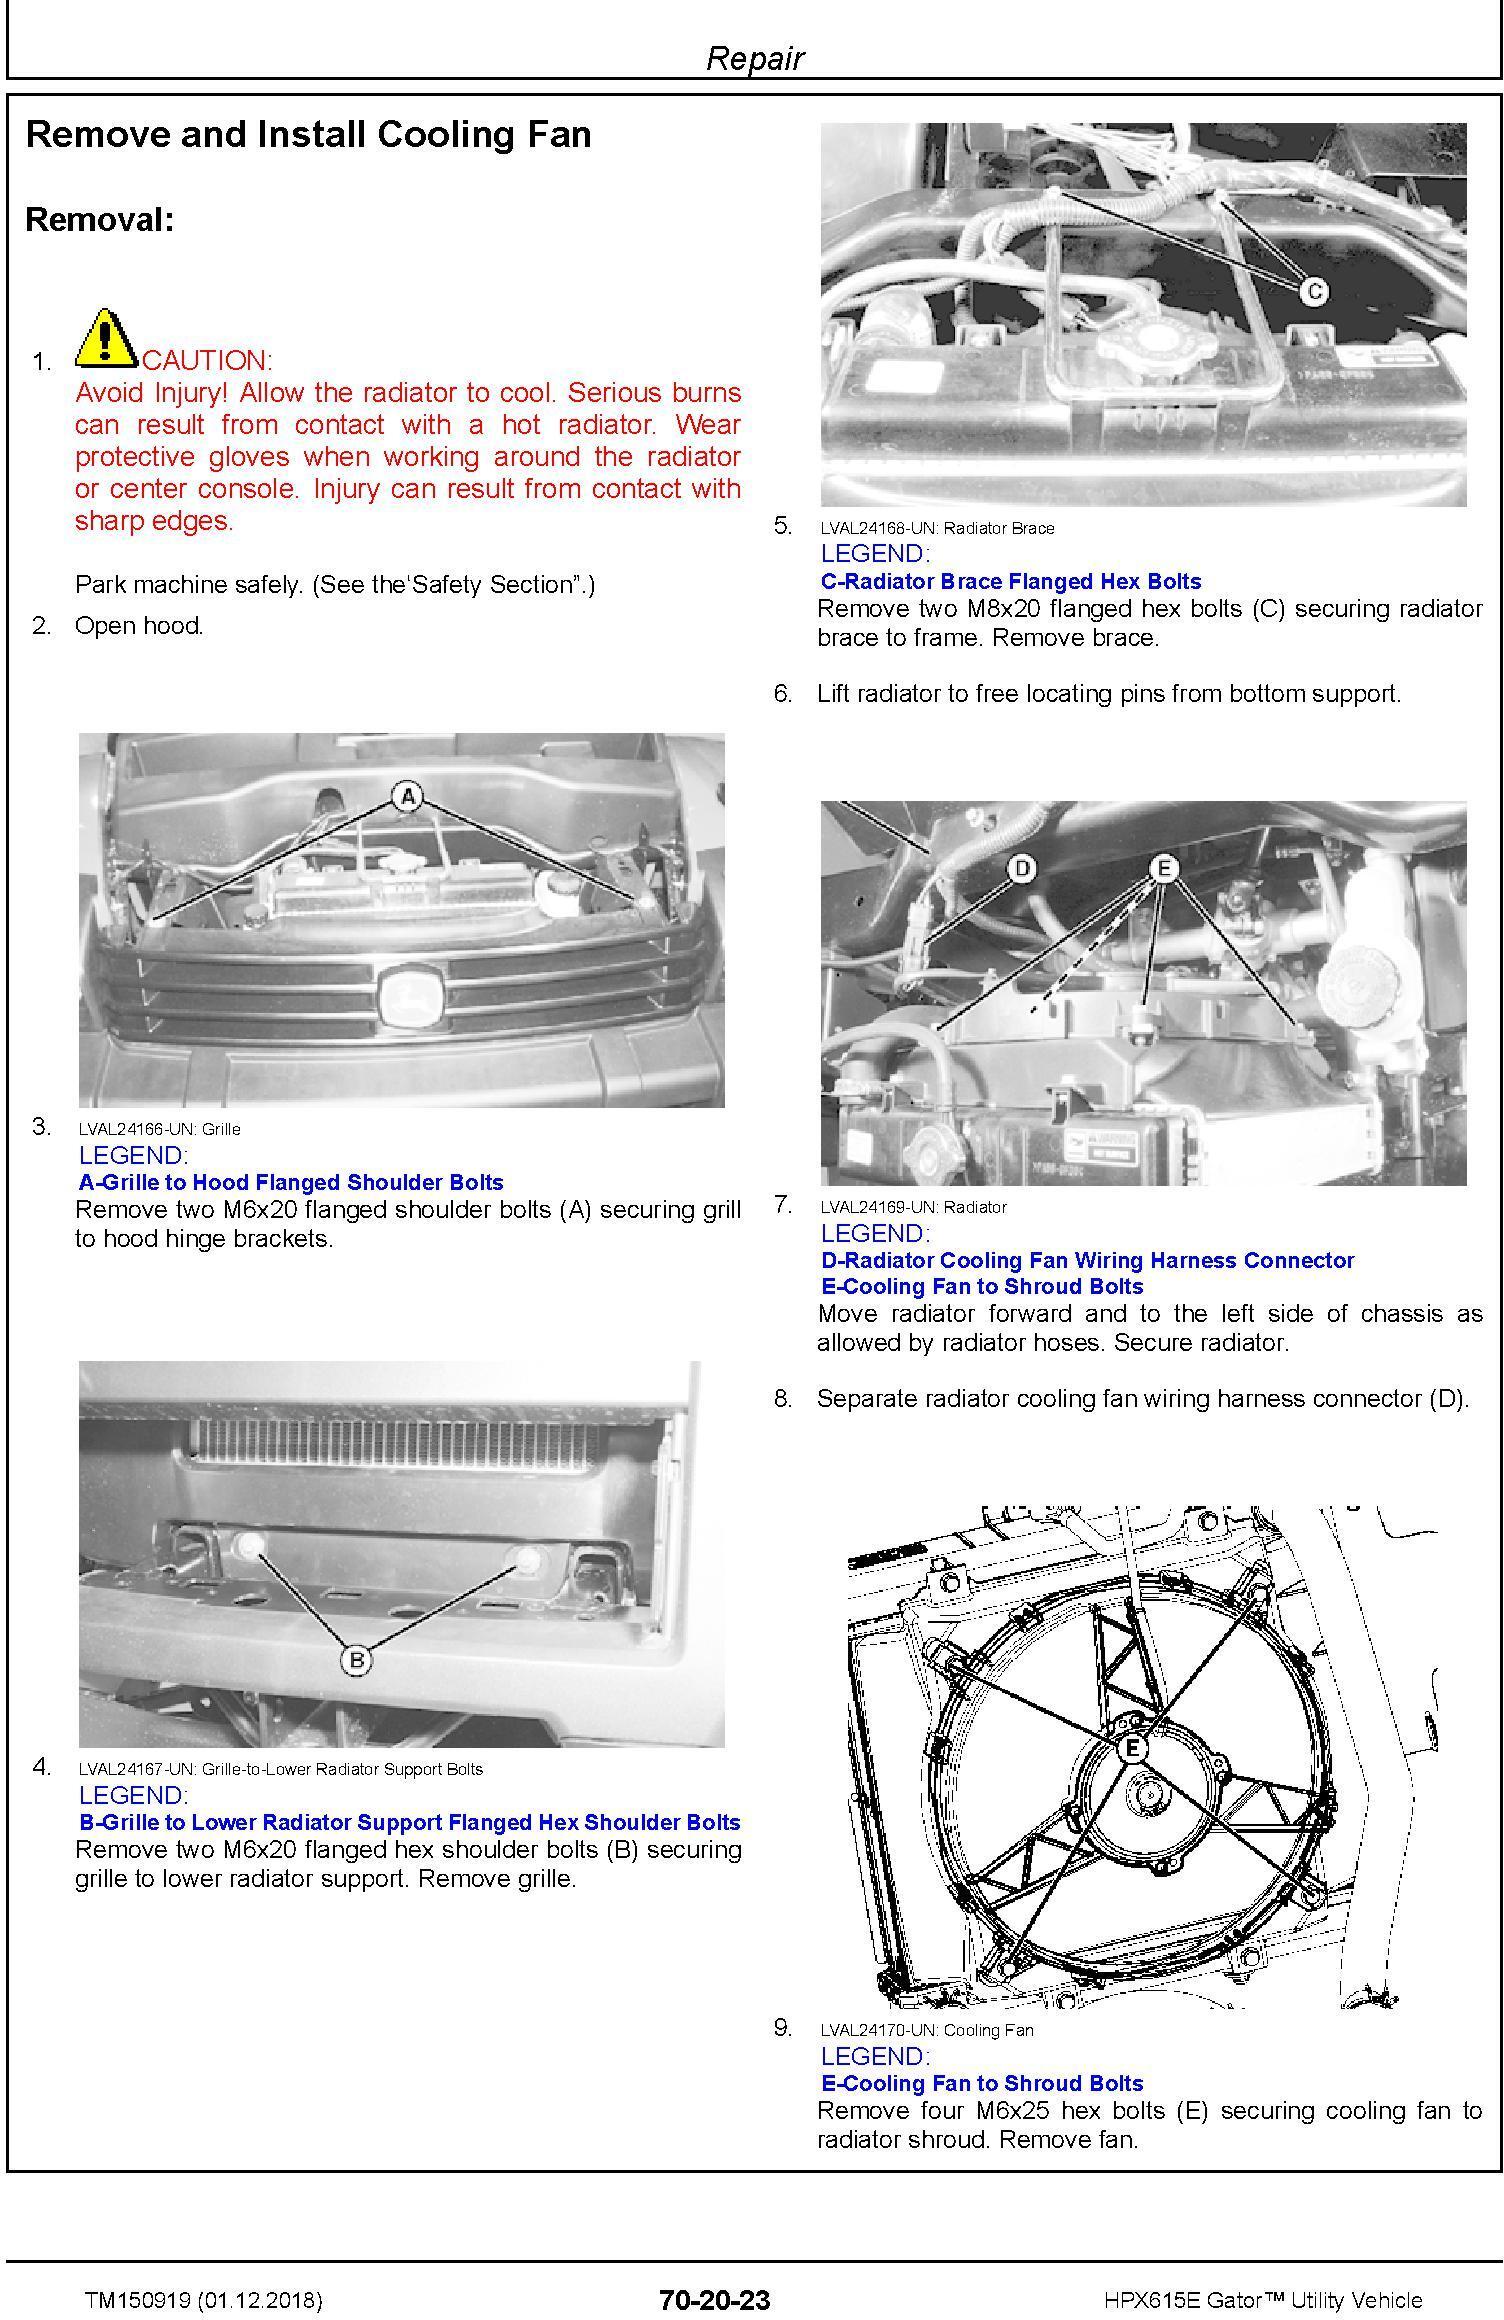 John Deere HPX615E Gator Utility Vehicle (SN. 010001-) Technical Manual (TM150919) - 2